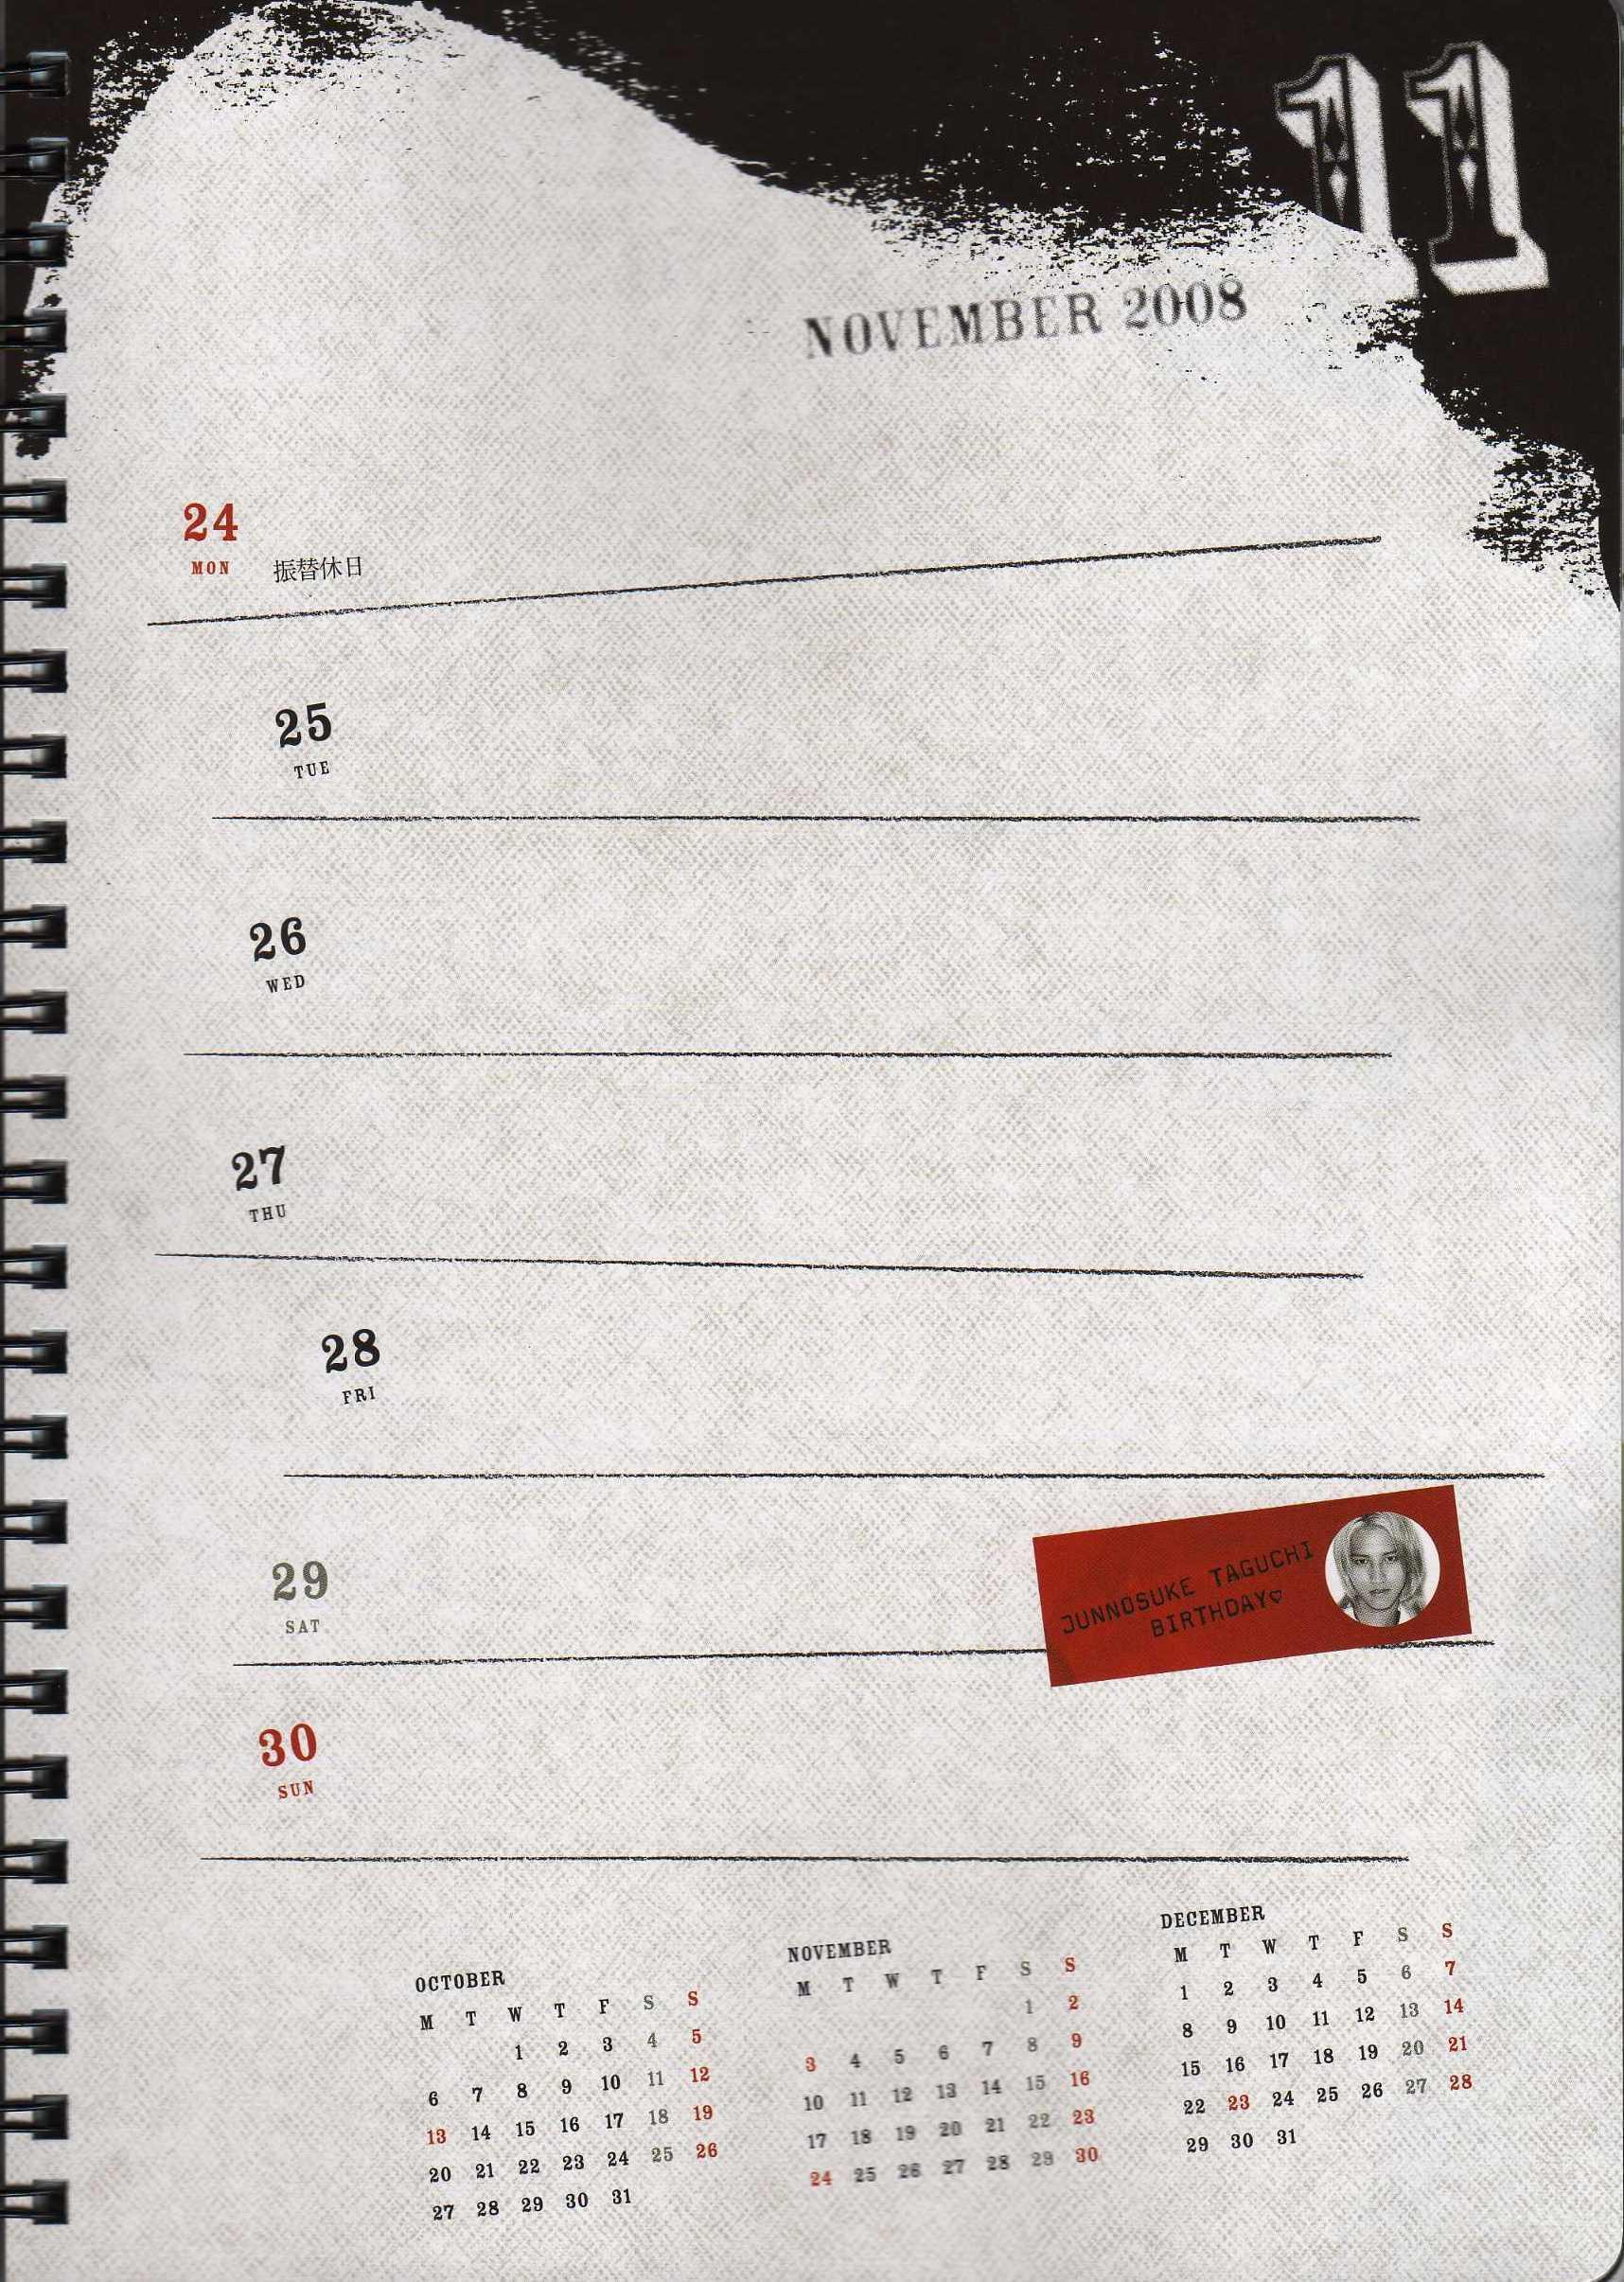 Calendar Quiz Calendar At A Glance National Day Calendar Kat Tun Calendar 20082009 Kat Tun Photo 7243444 Fanpop